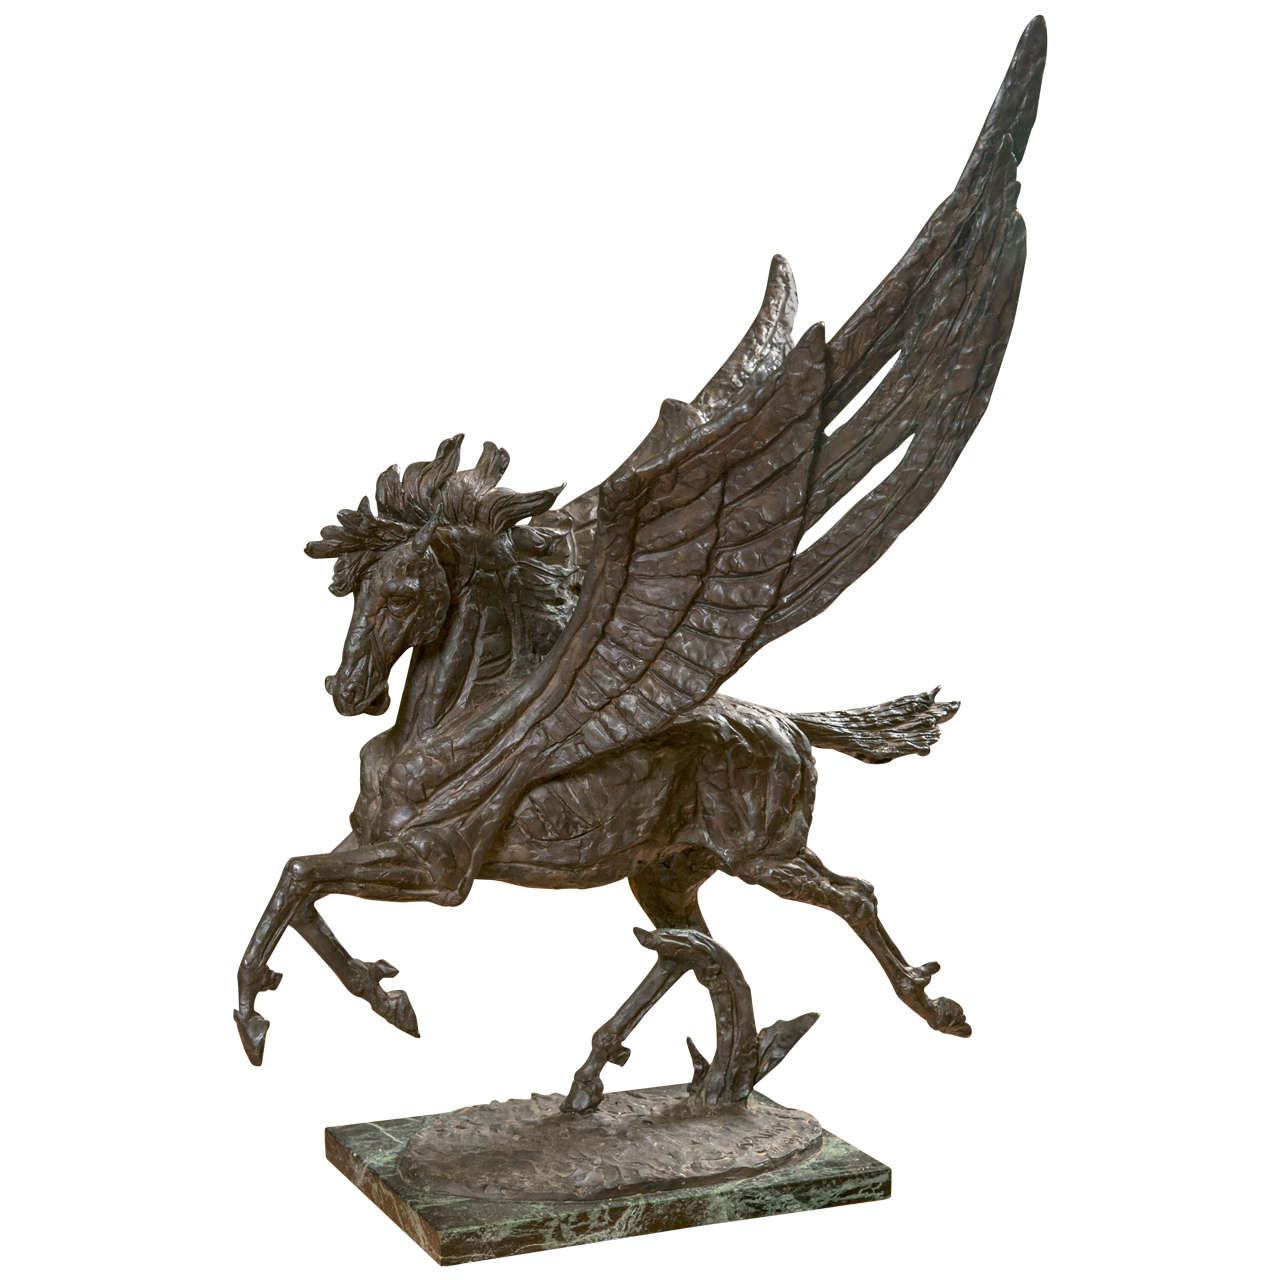 Bronze Pegasus Statue By Laszlo Ispanky For Sale At 1stdibs